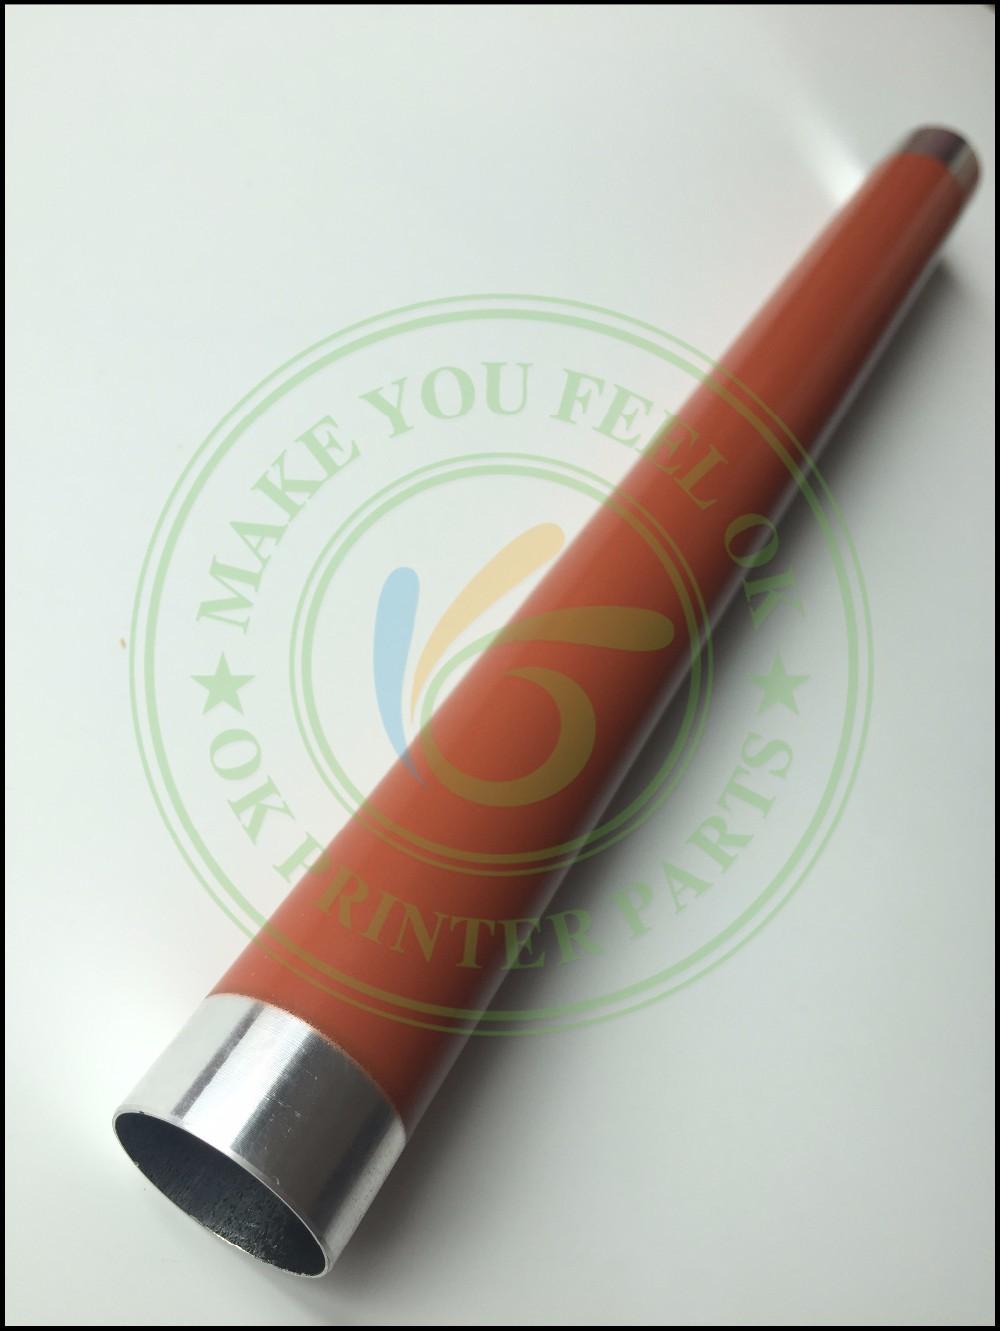 2HS25230 2HS25231 Upper Fuser Roller Heat Roller for Kyocera FS1100 1110 FS1120 FS1300 FS1320 FS1028 FS1024 FS2000 KM2810 KM2820<br><br>Aliexpress